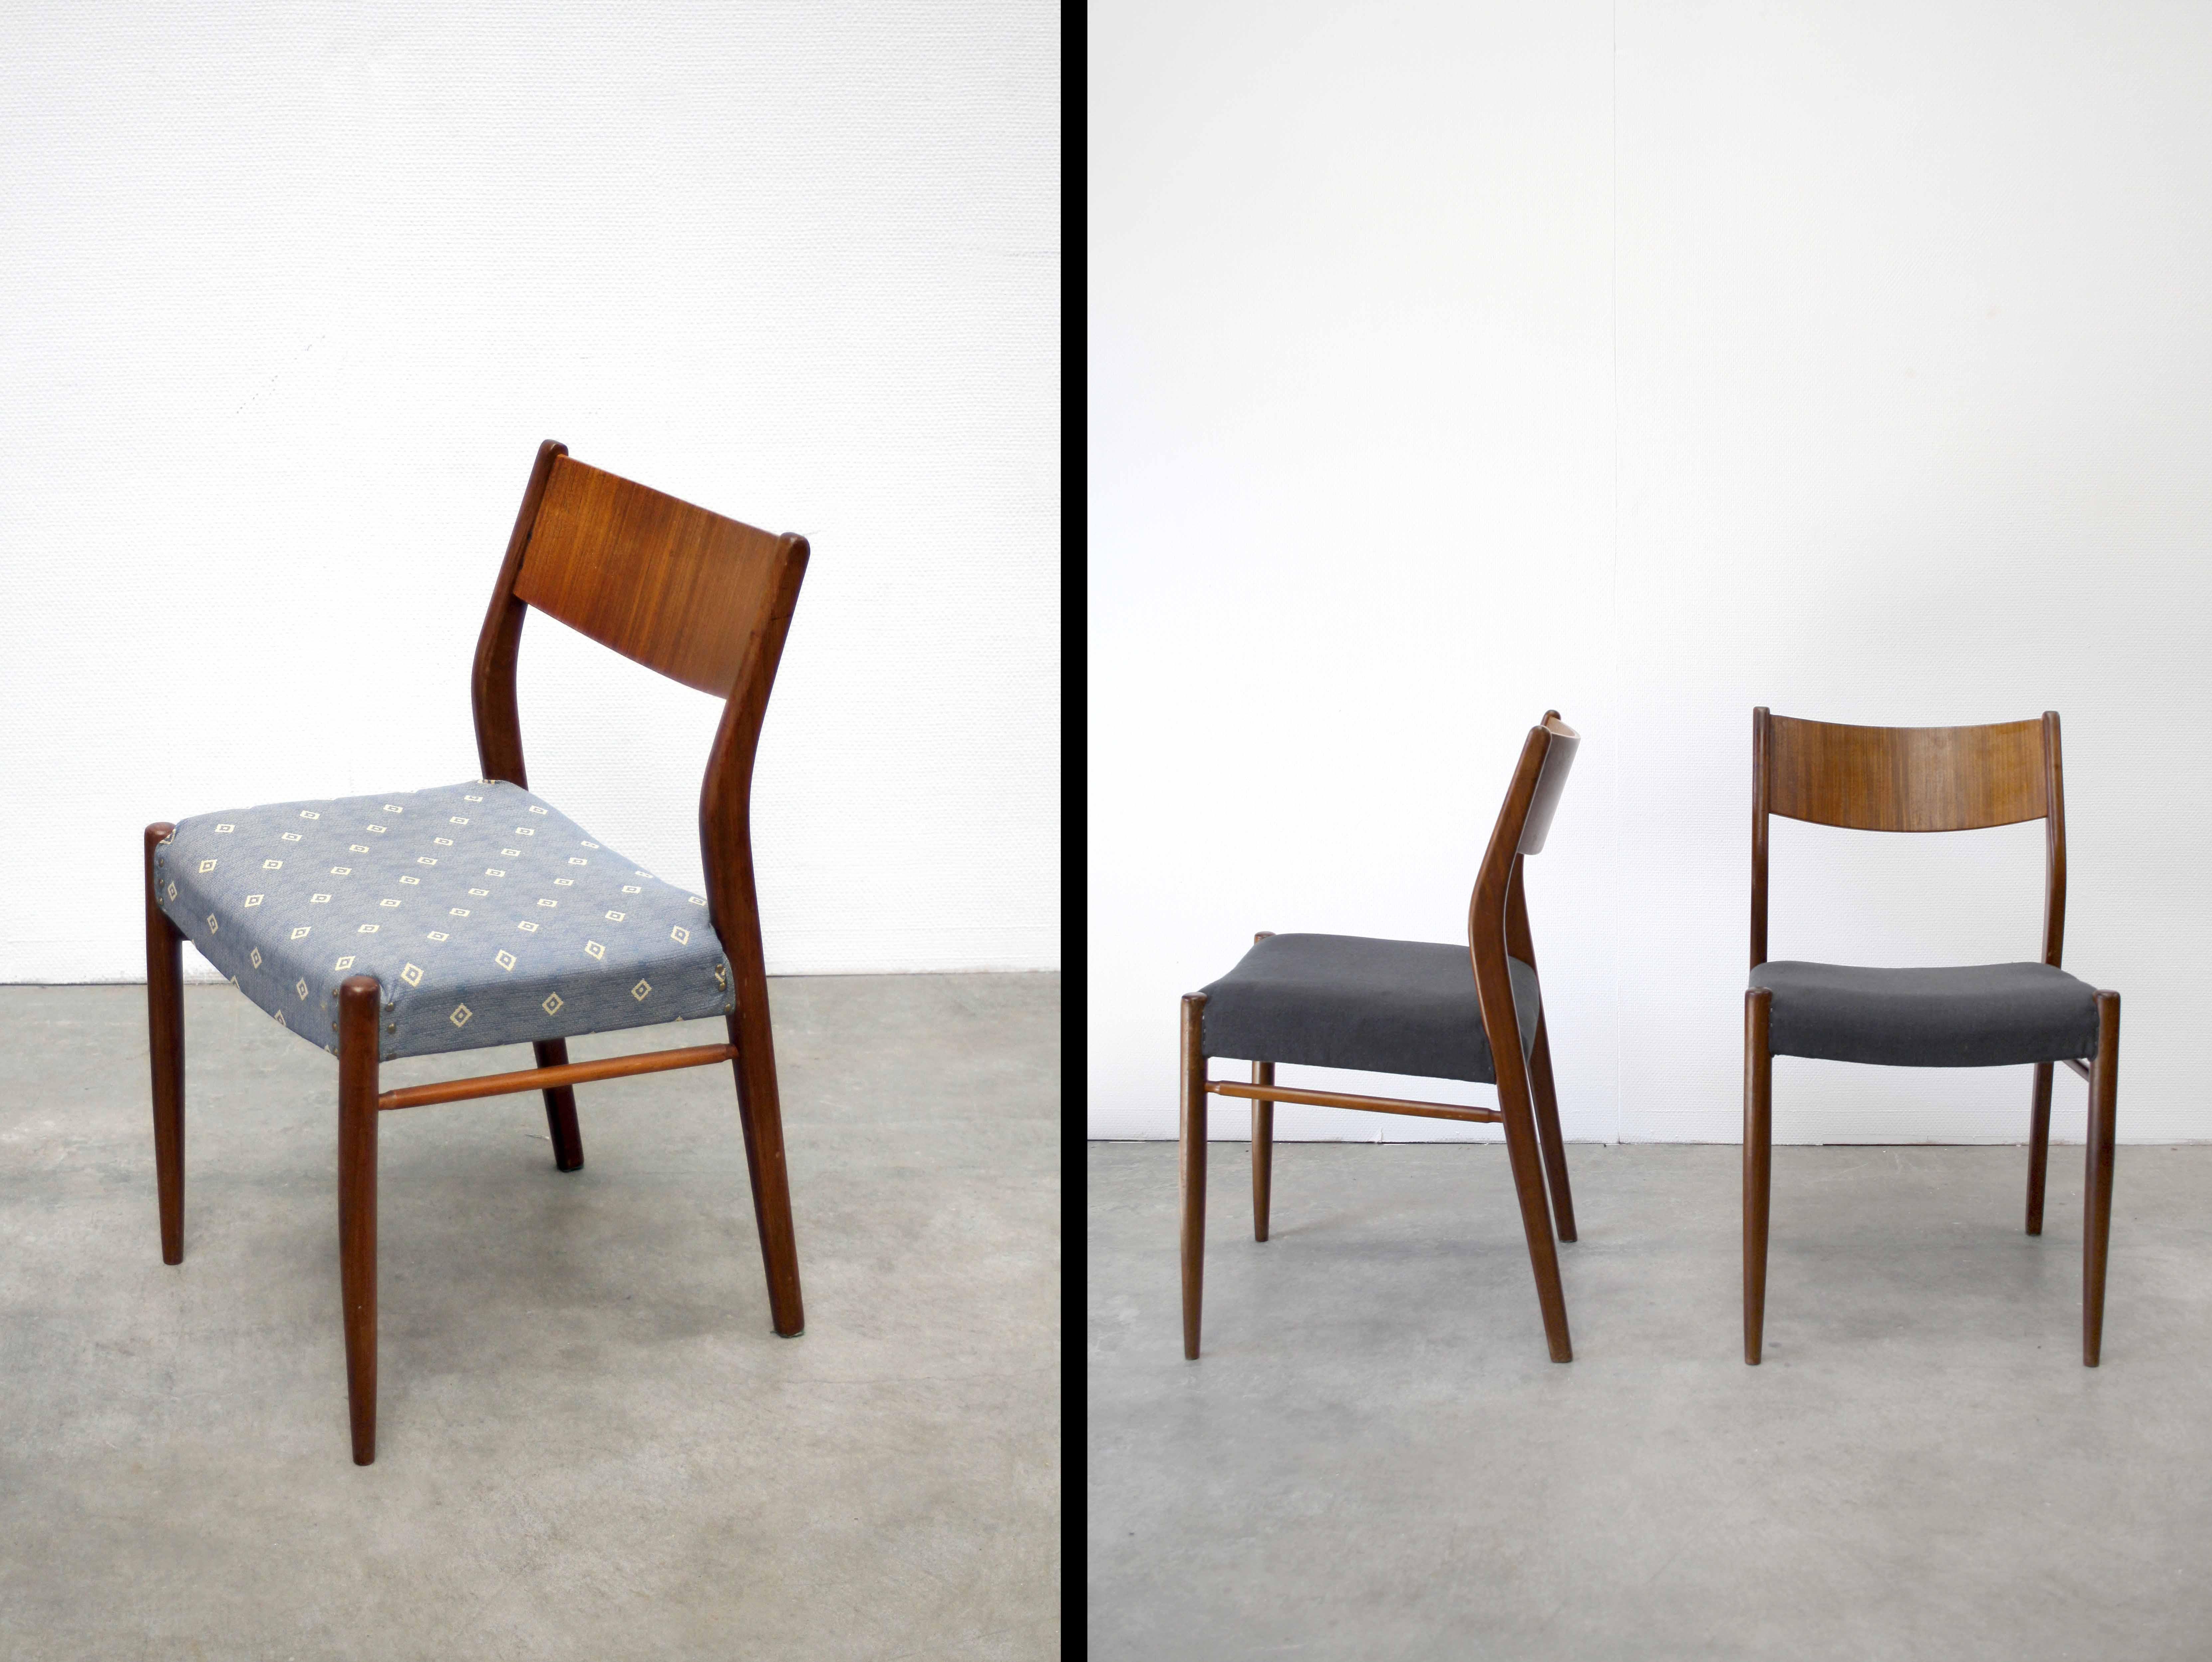 Design Pastoe Stoelen : Vier pastoe sa10 stoelen van ons